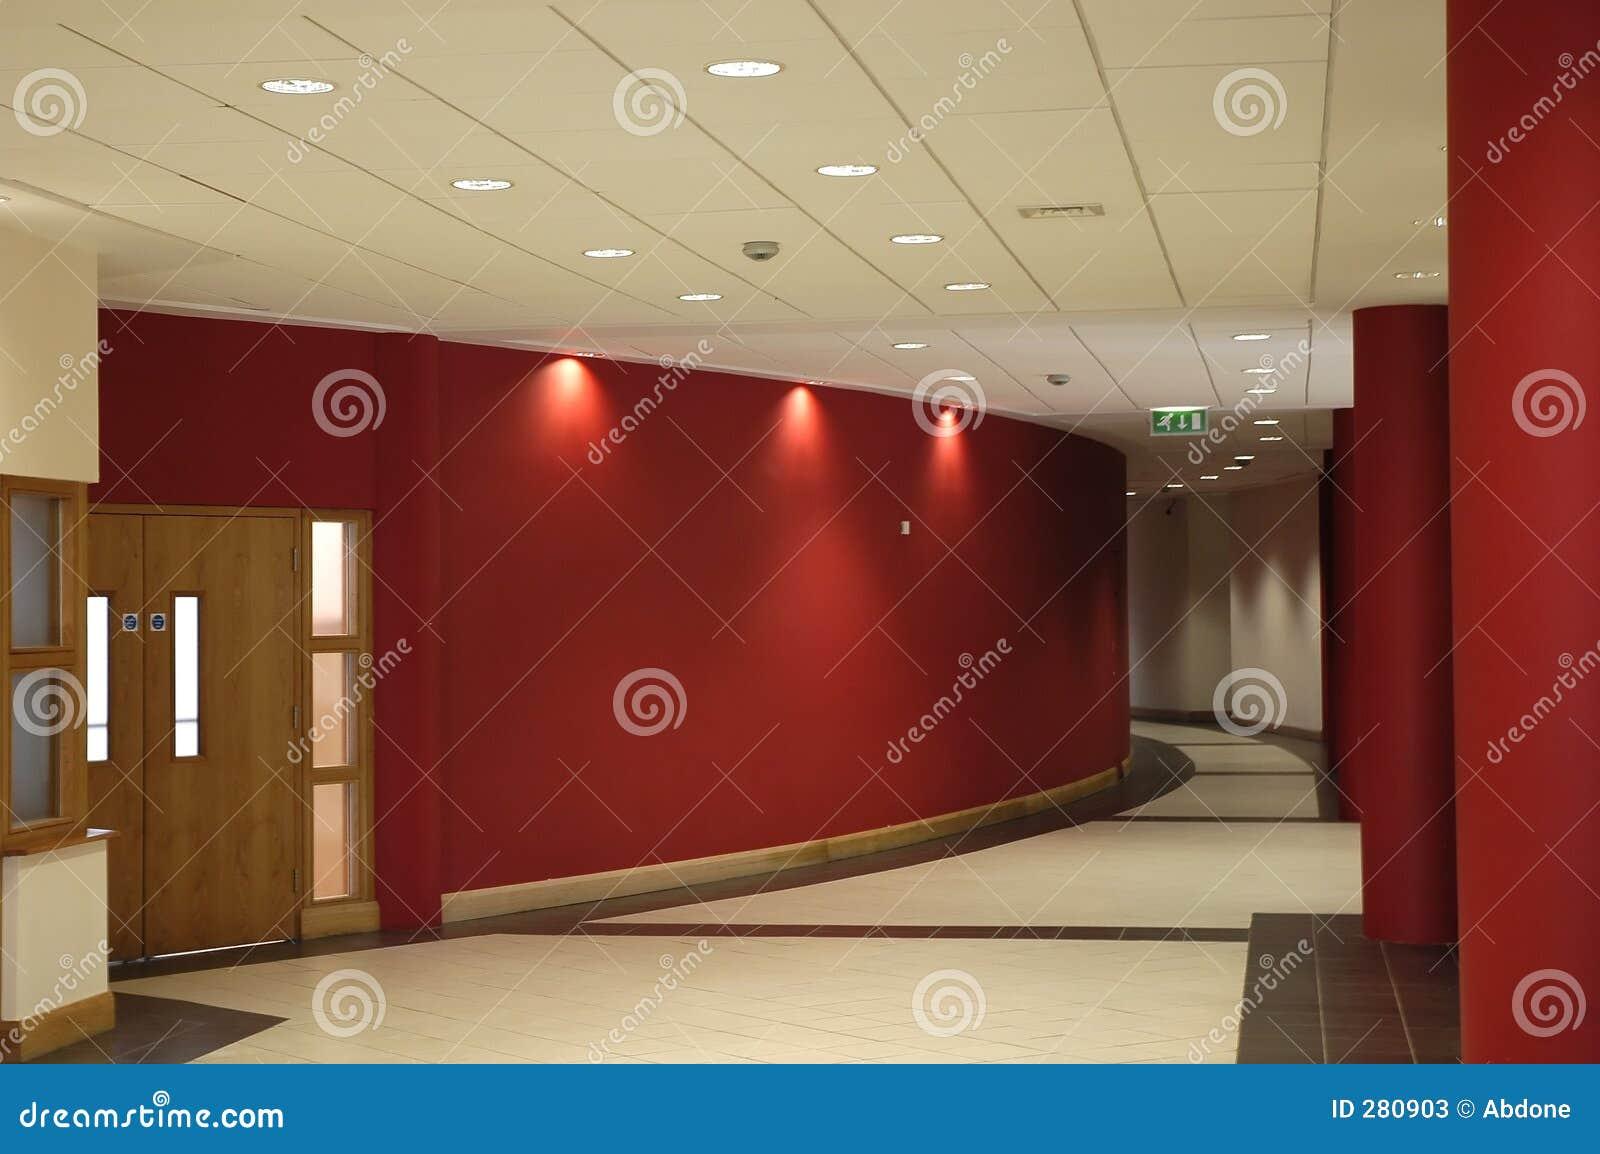 couloir rouge photos stock image 280903. Black Bedroom Furniture Sets. Home Design Ideas